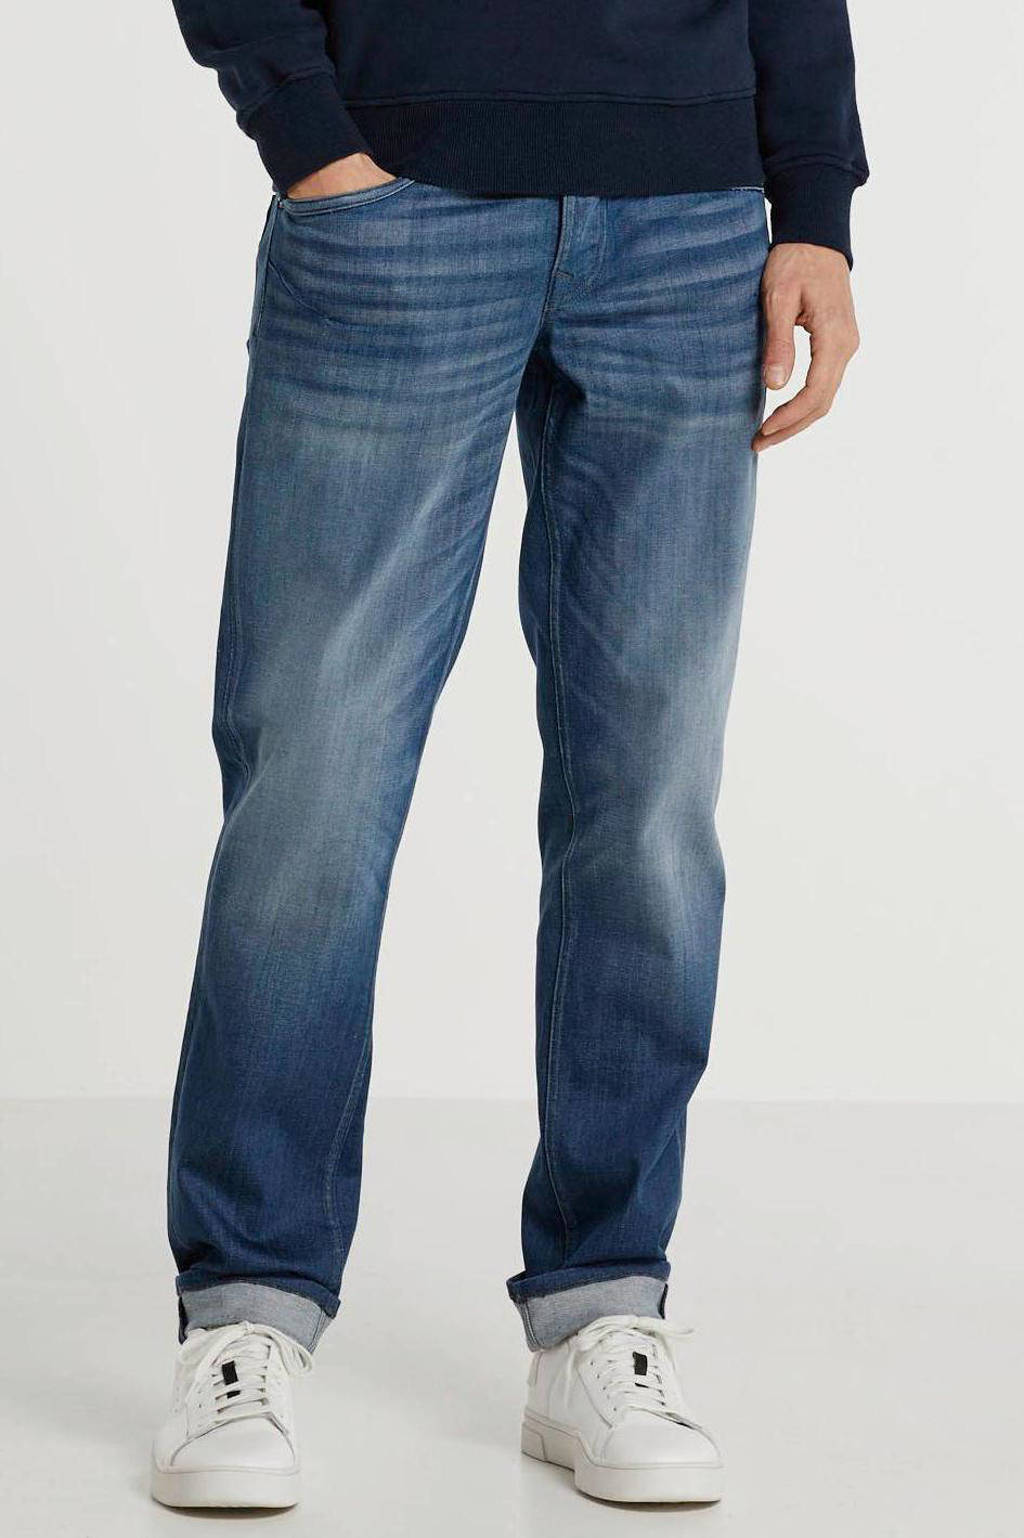 PME Legend regular straight fit jeans Skyhawk mid grey blue, Mid grey blue